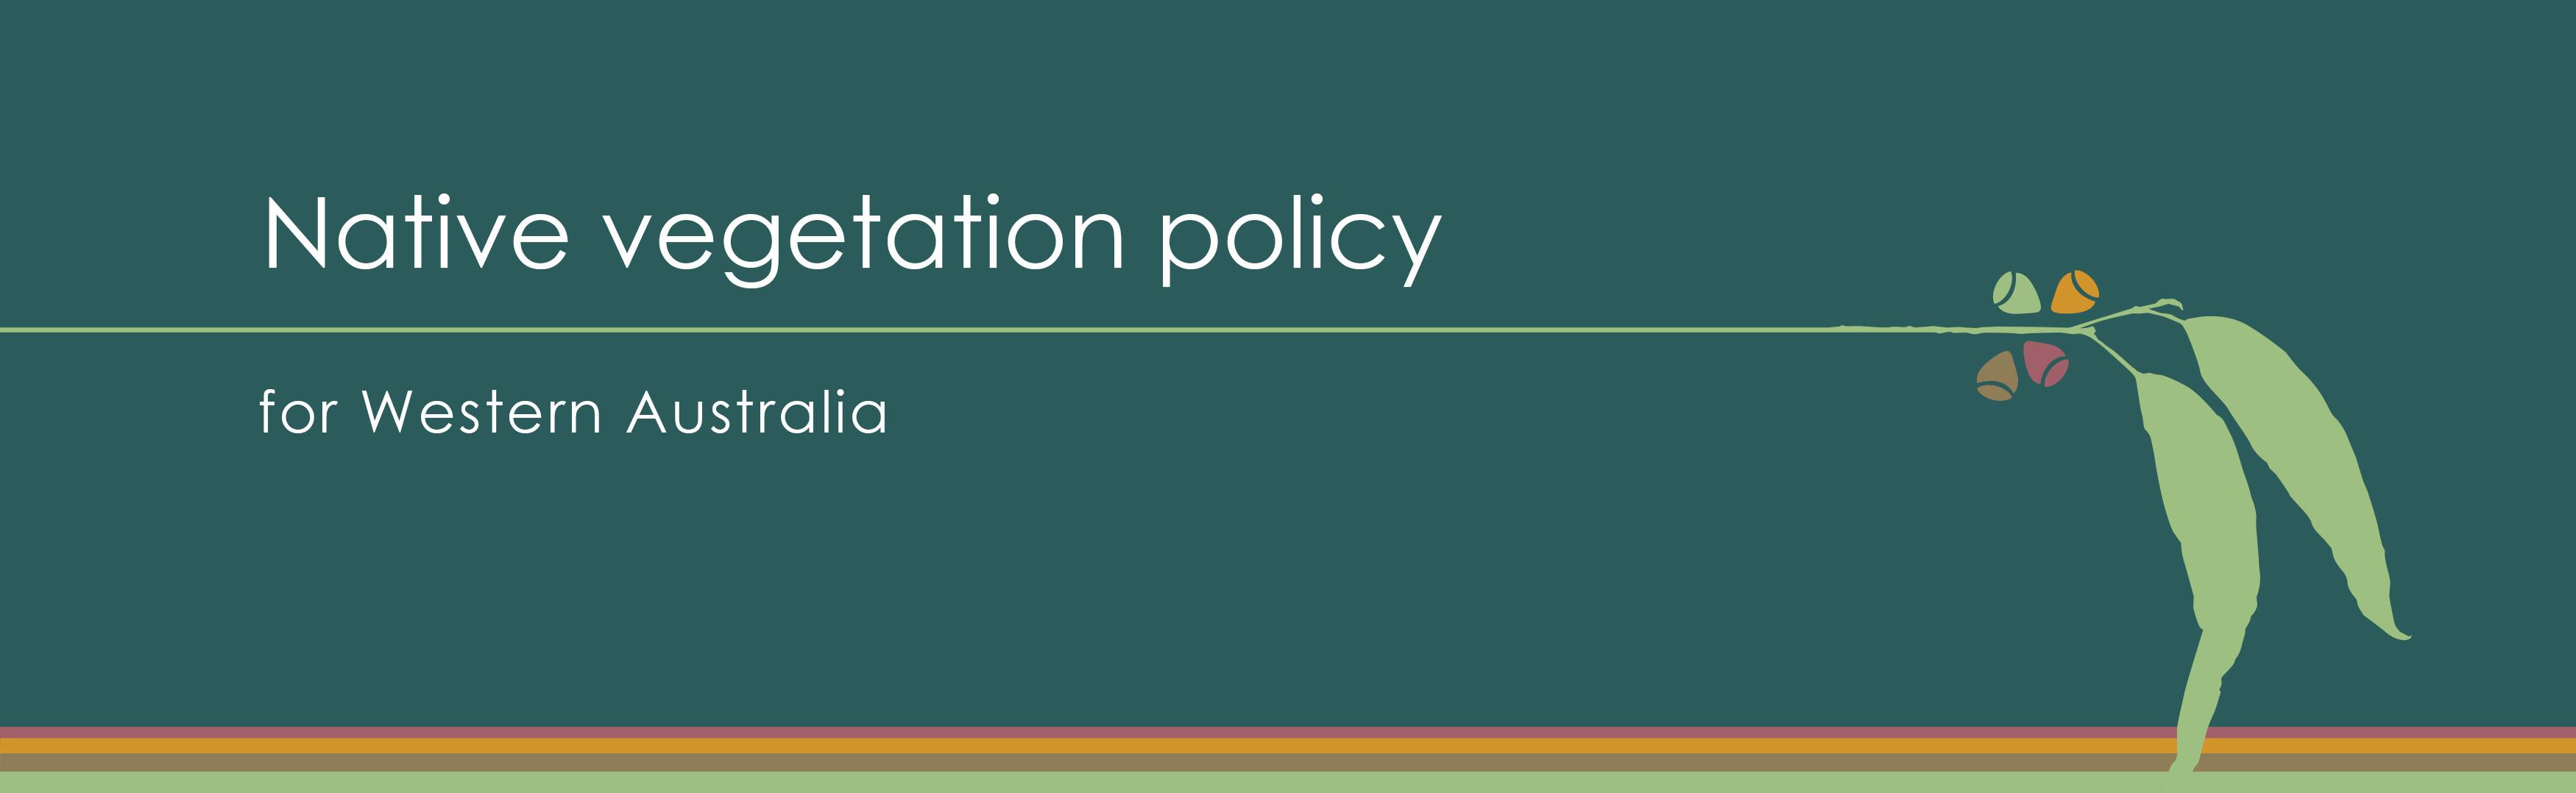 native vegetation policy banner image